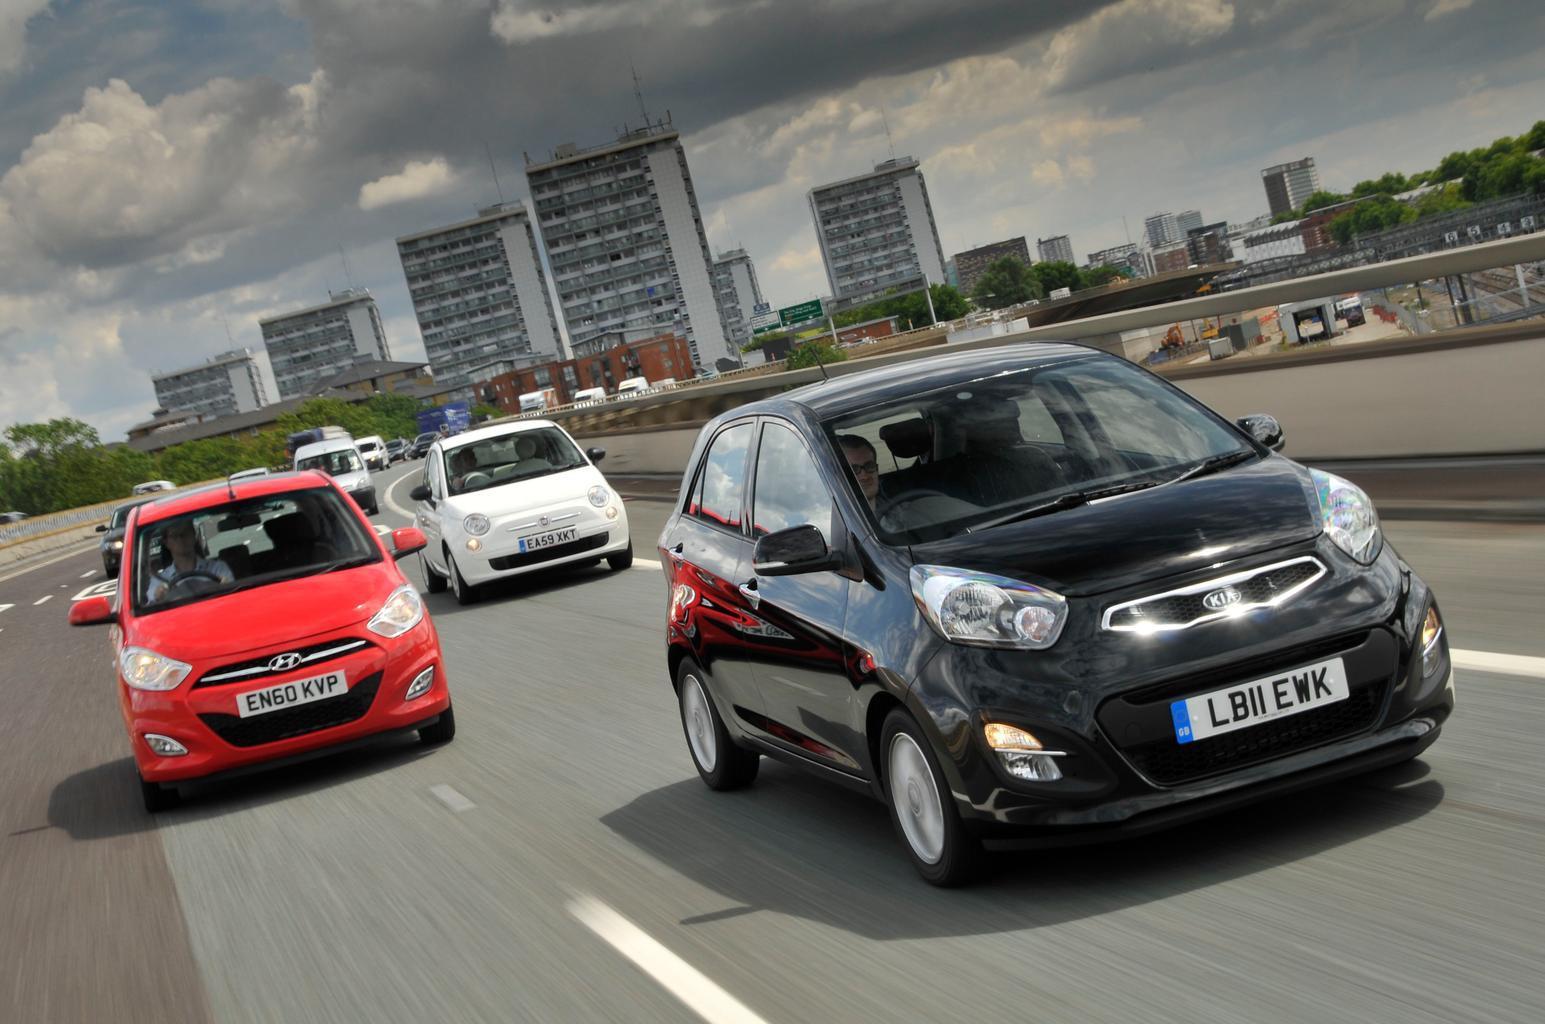 Used test: Fiat 500 vs Kia Picanto vs Hyundai i10